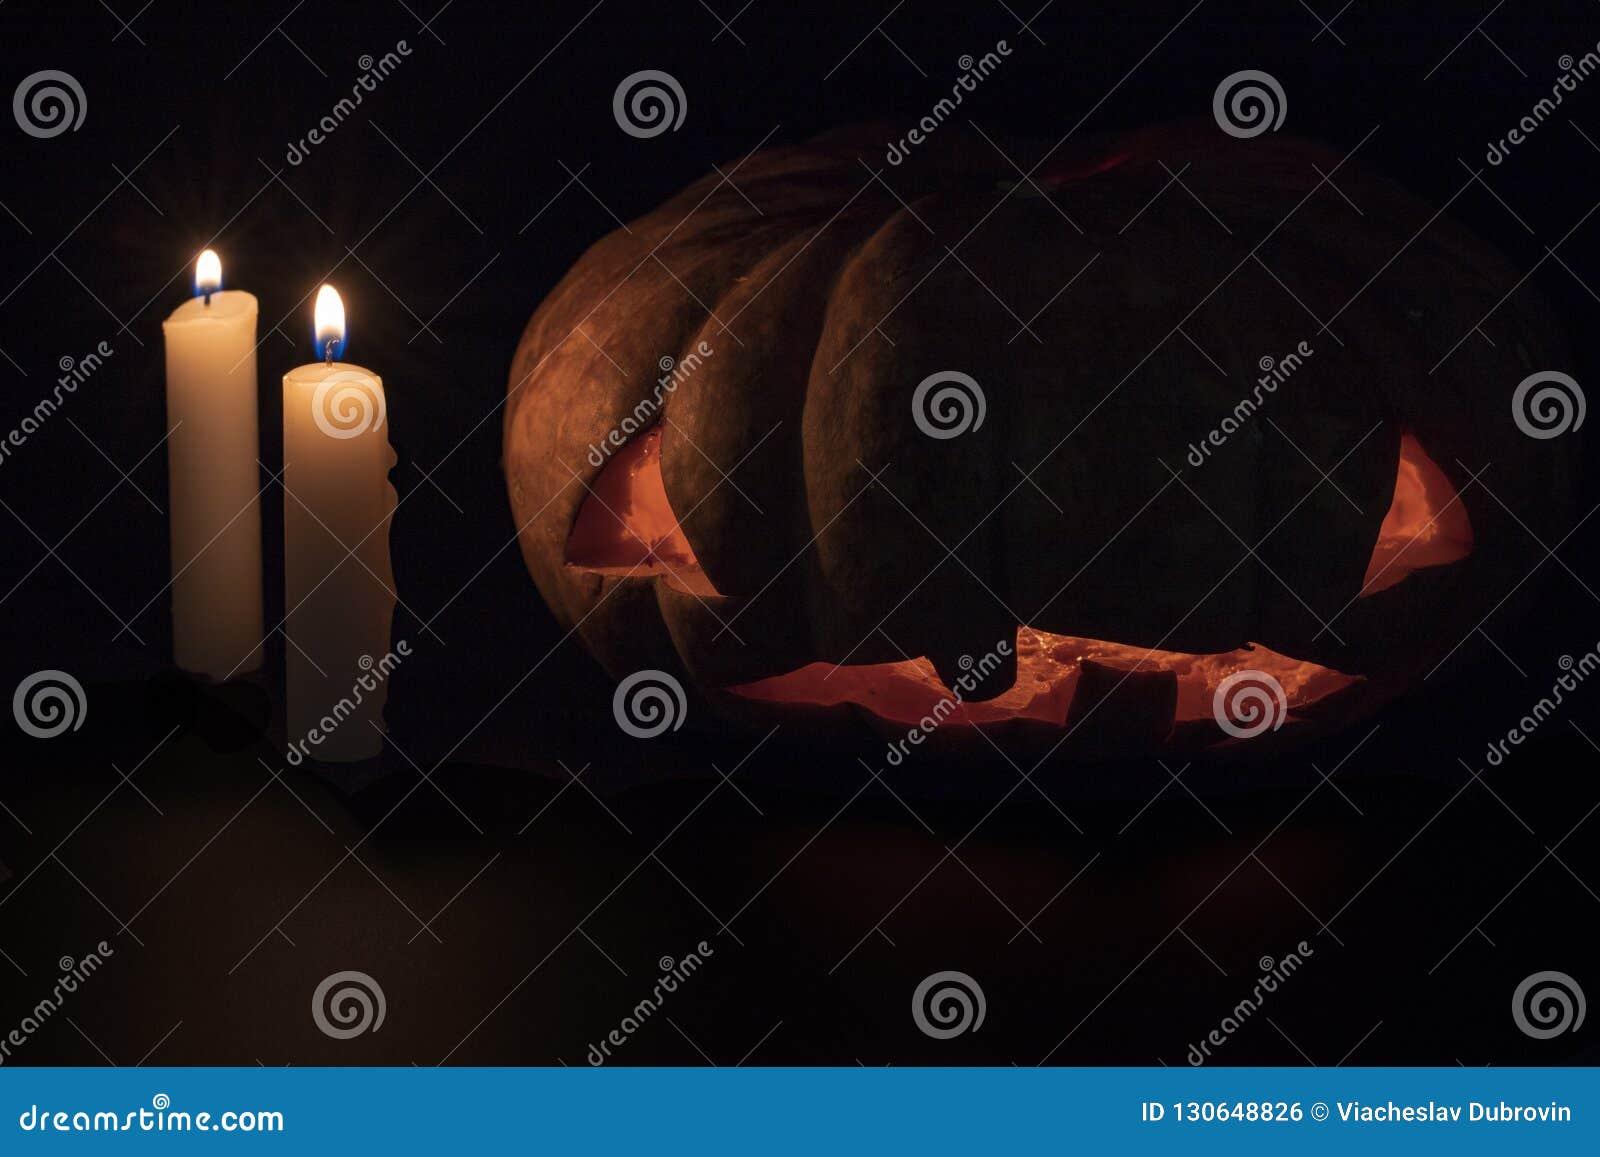 Halloween Pumpkin And Candle On Dark Background Halloween Eve